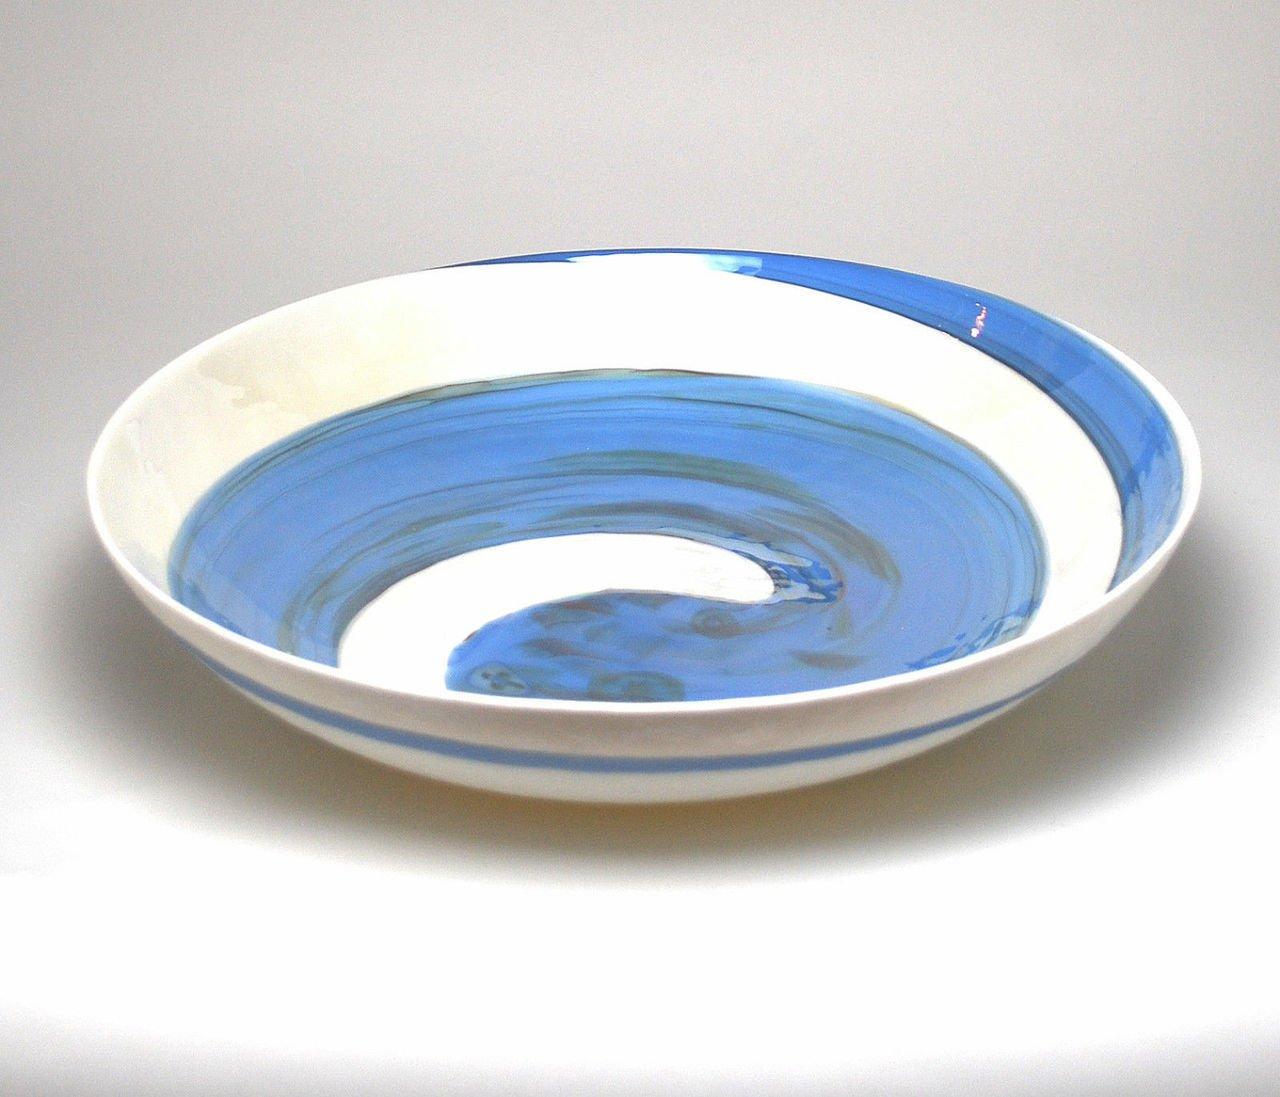 HOME DECOR - ''AEGEAN SEA'' MURANO GLASS CENTERPIECE BOWL - IVORY / BLUE SWIRL